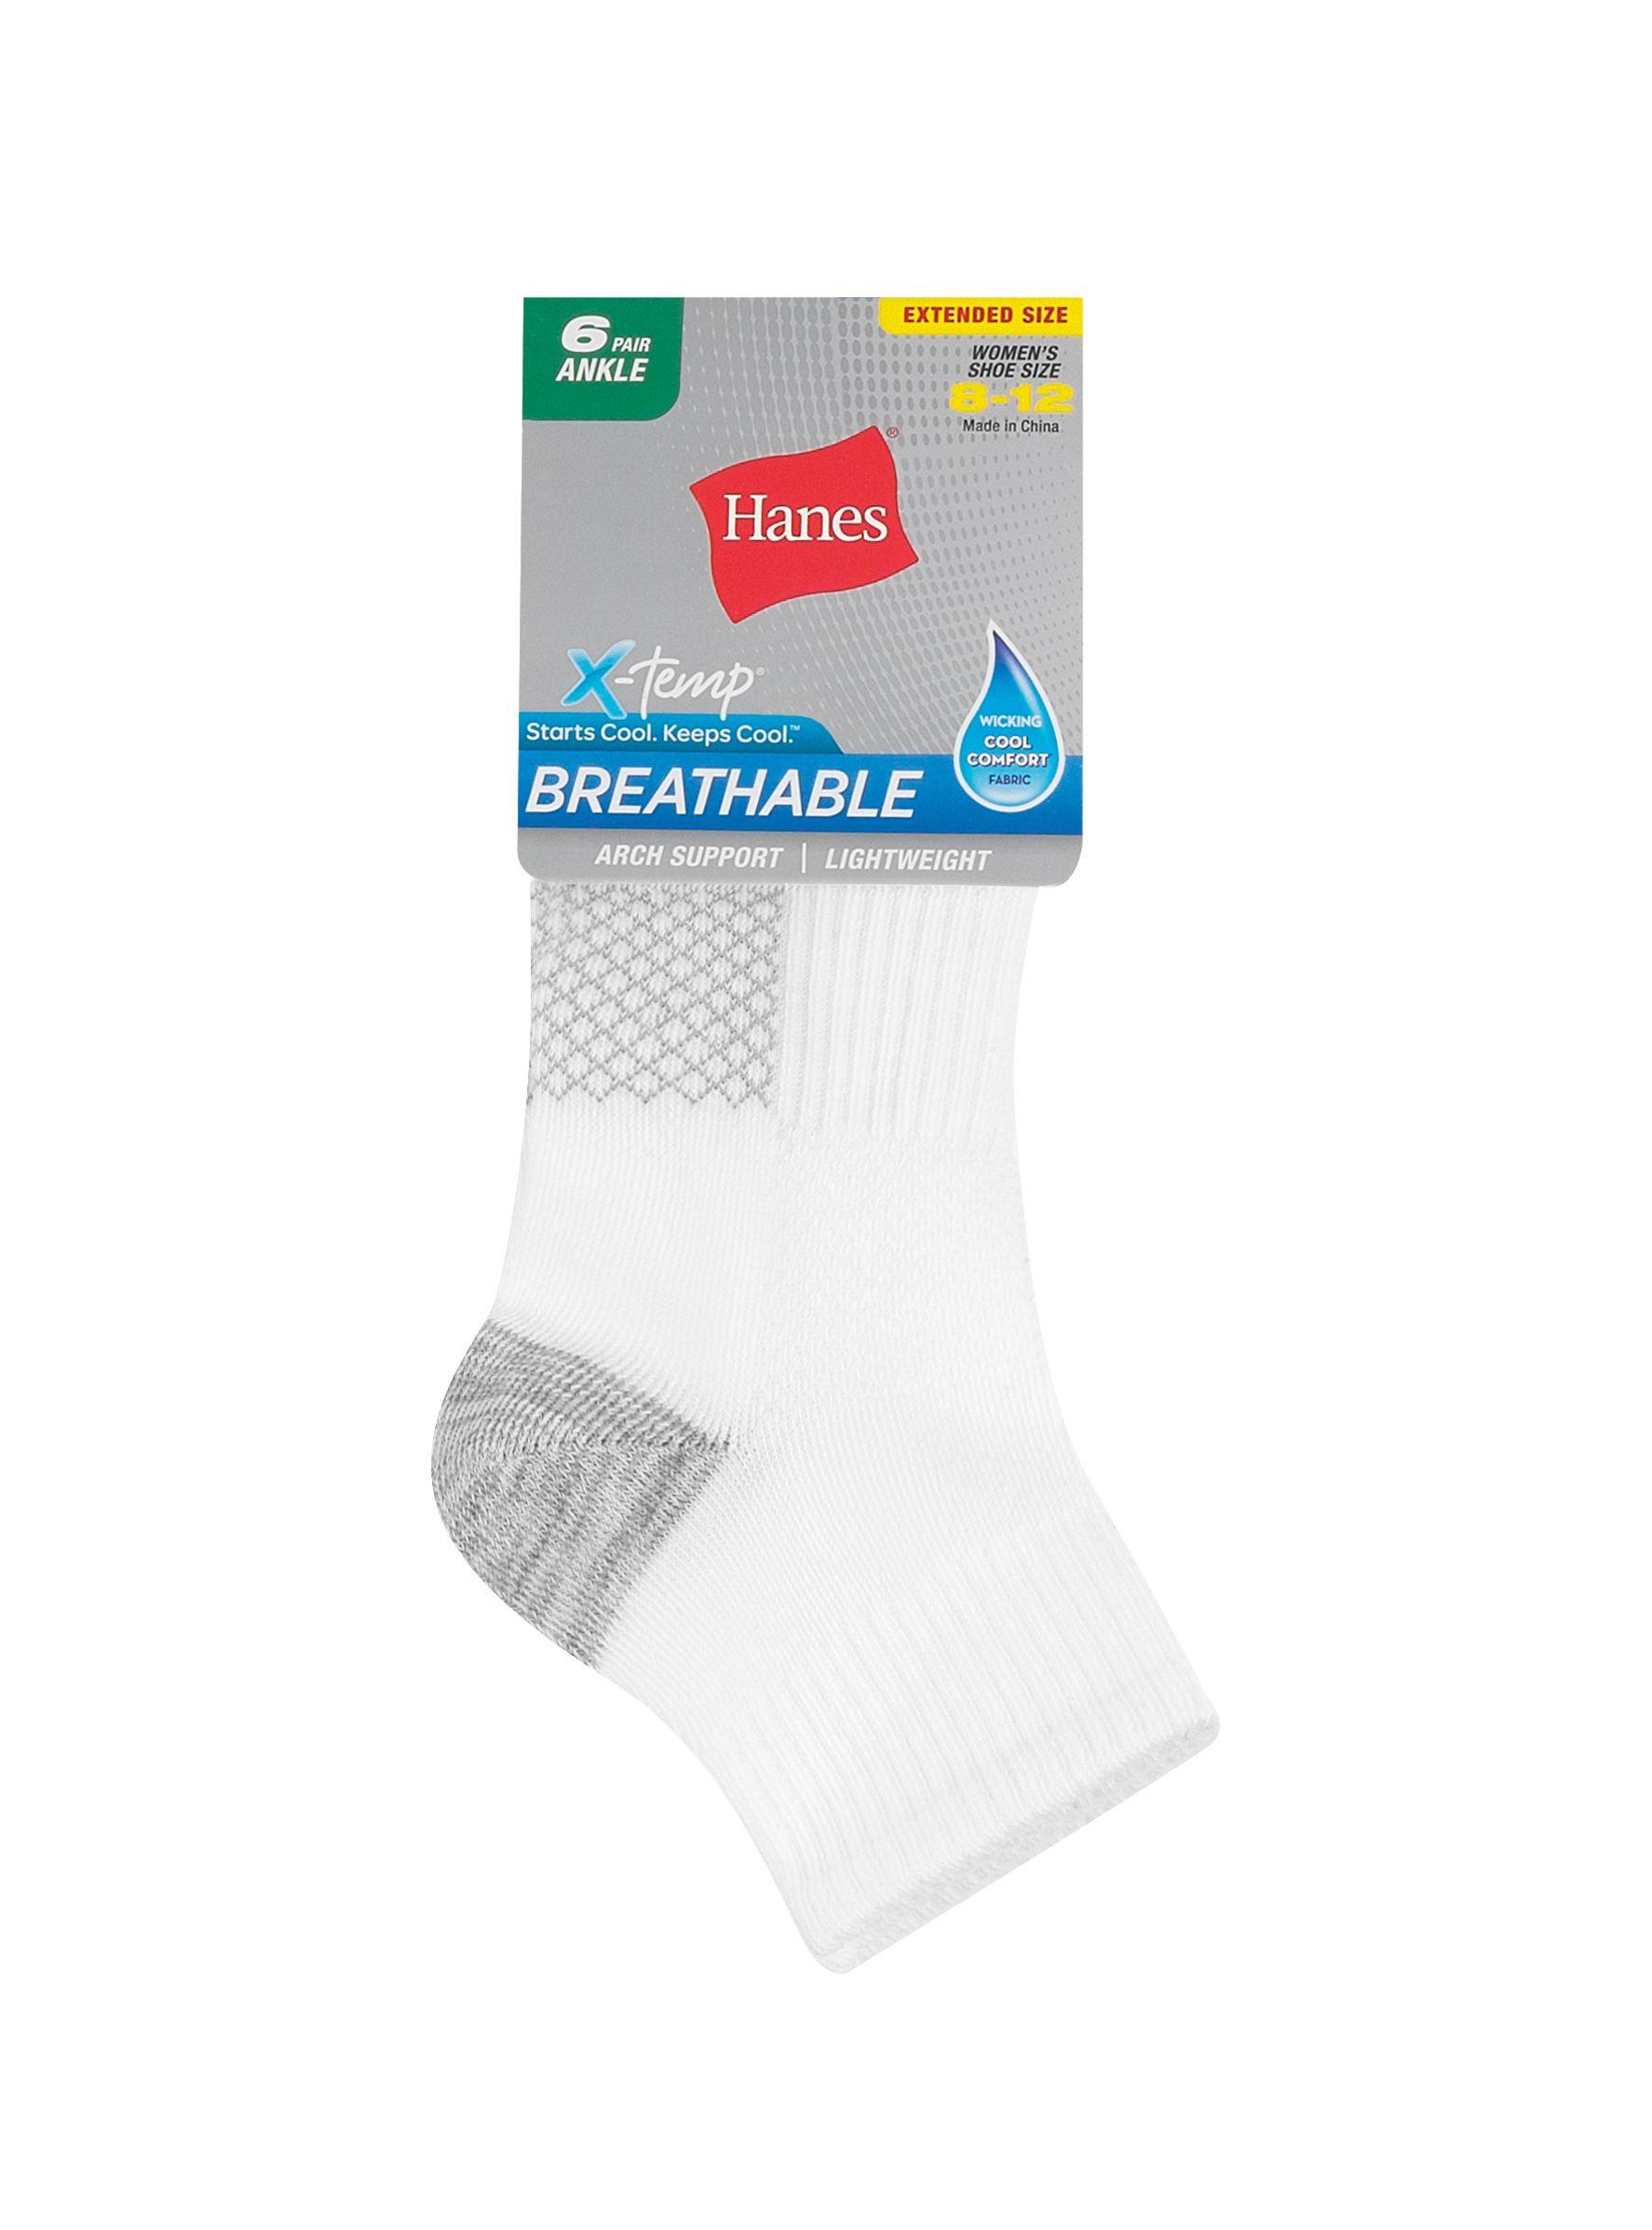 hanes women's breathable lightweight ankle socks extended sizes 8-12, 6-pack women Hanes